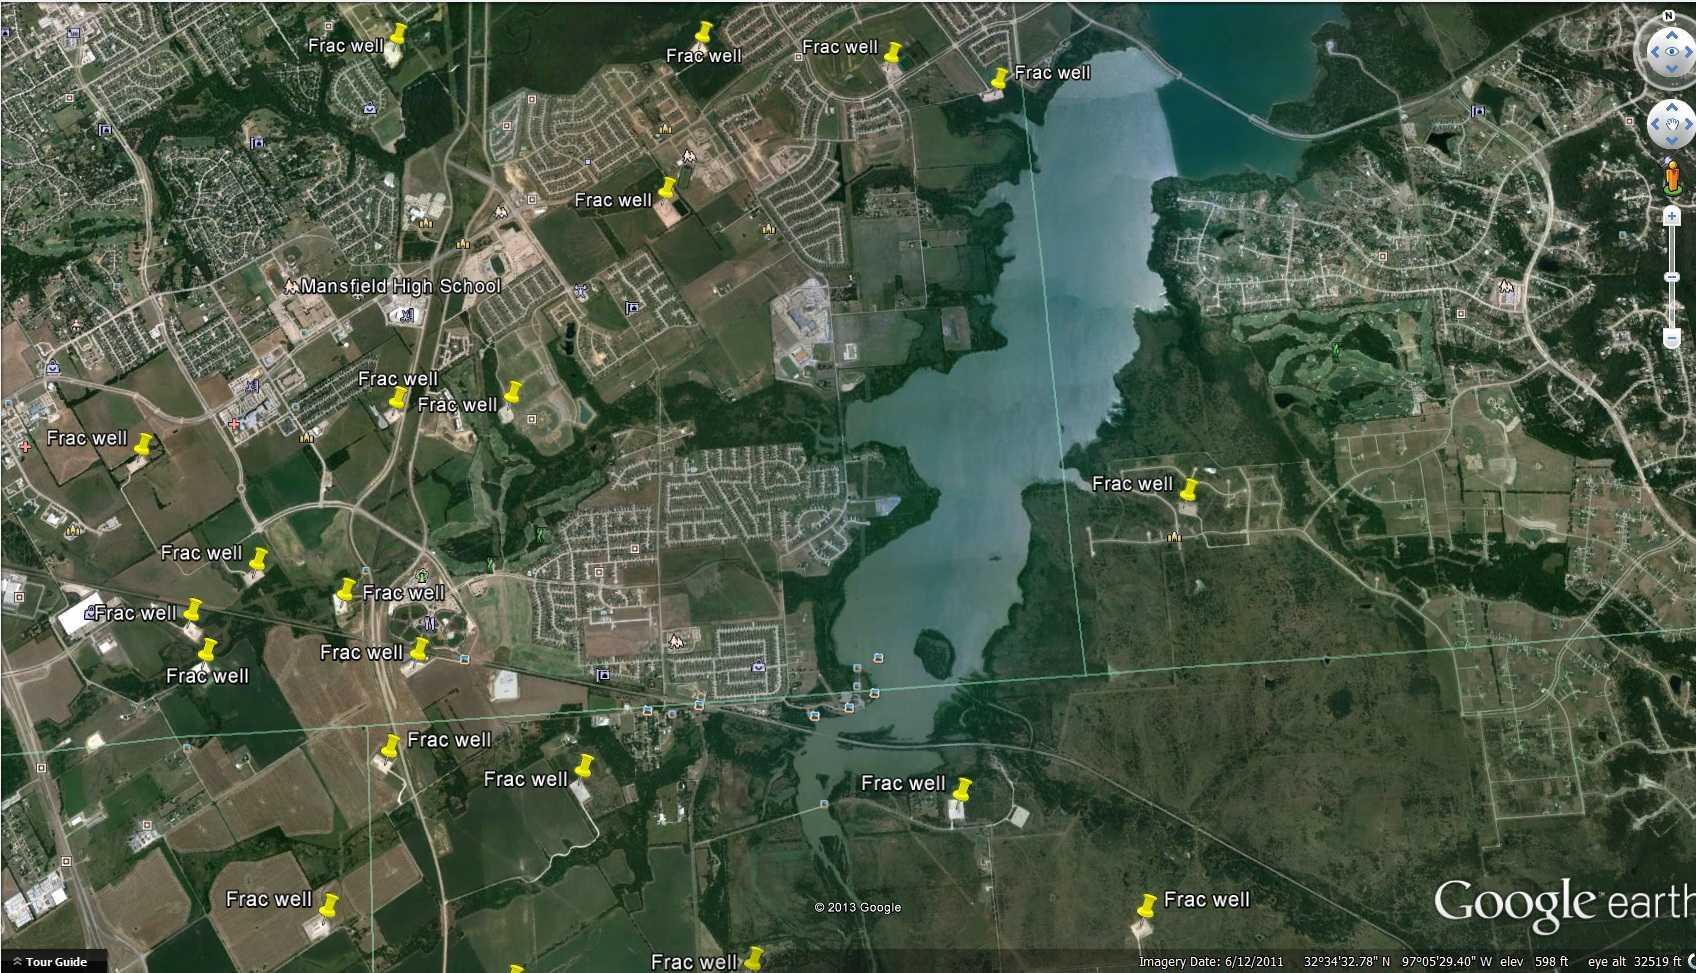 Químicos usados en fracking invaden acuíferos en Texas